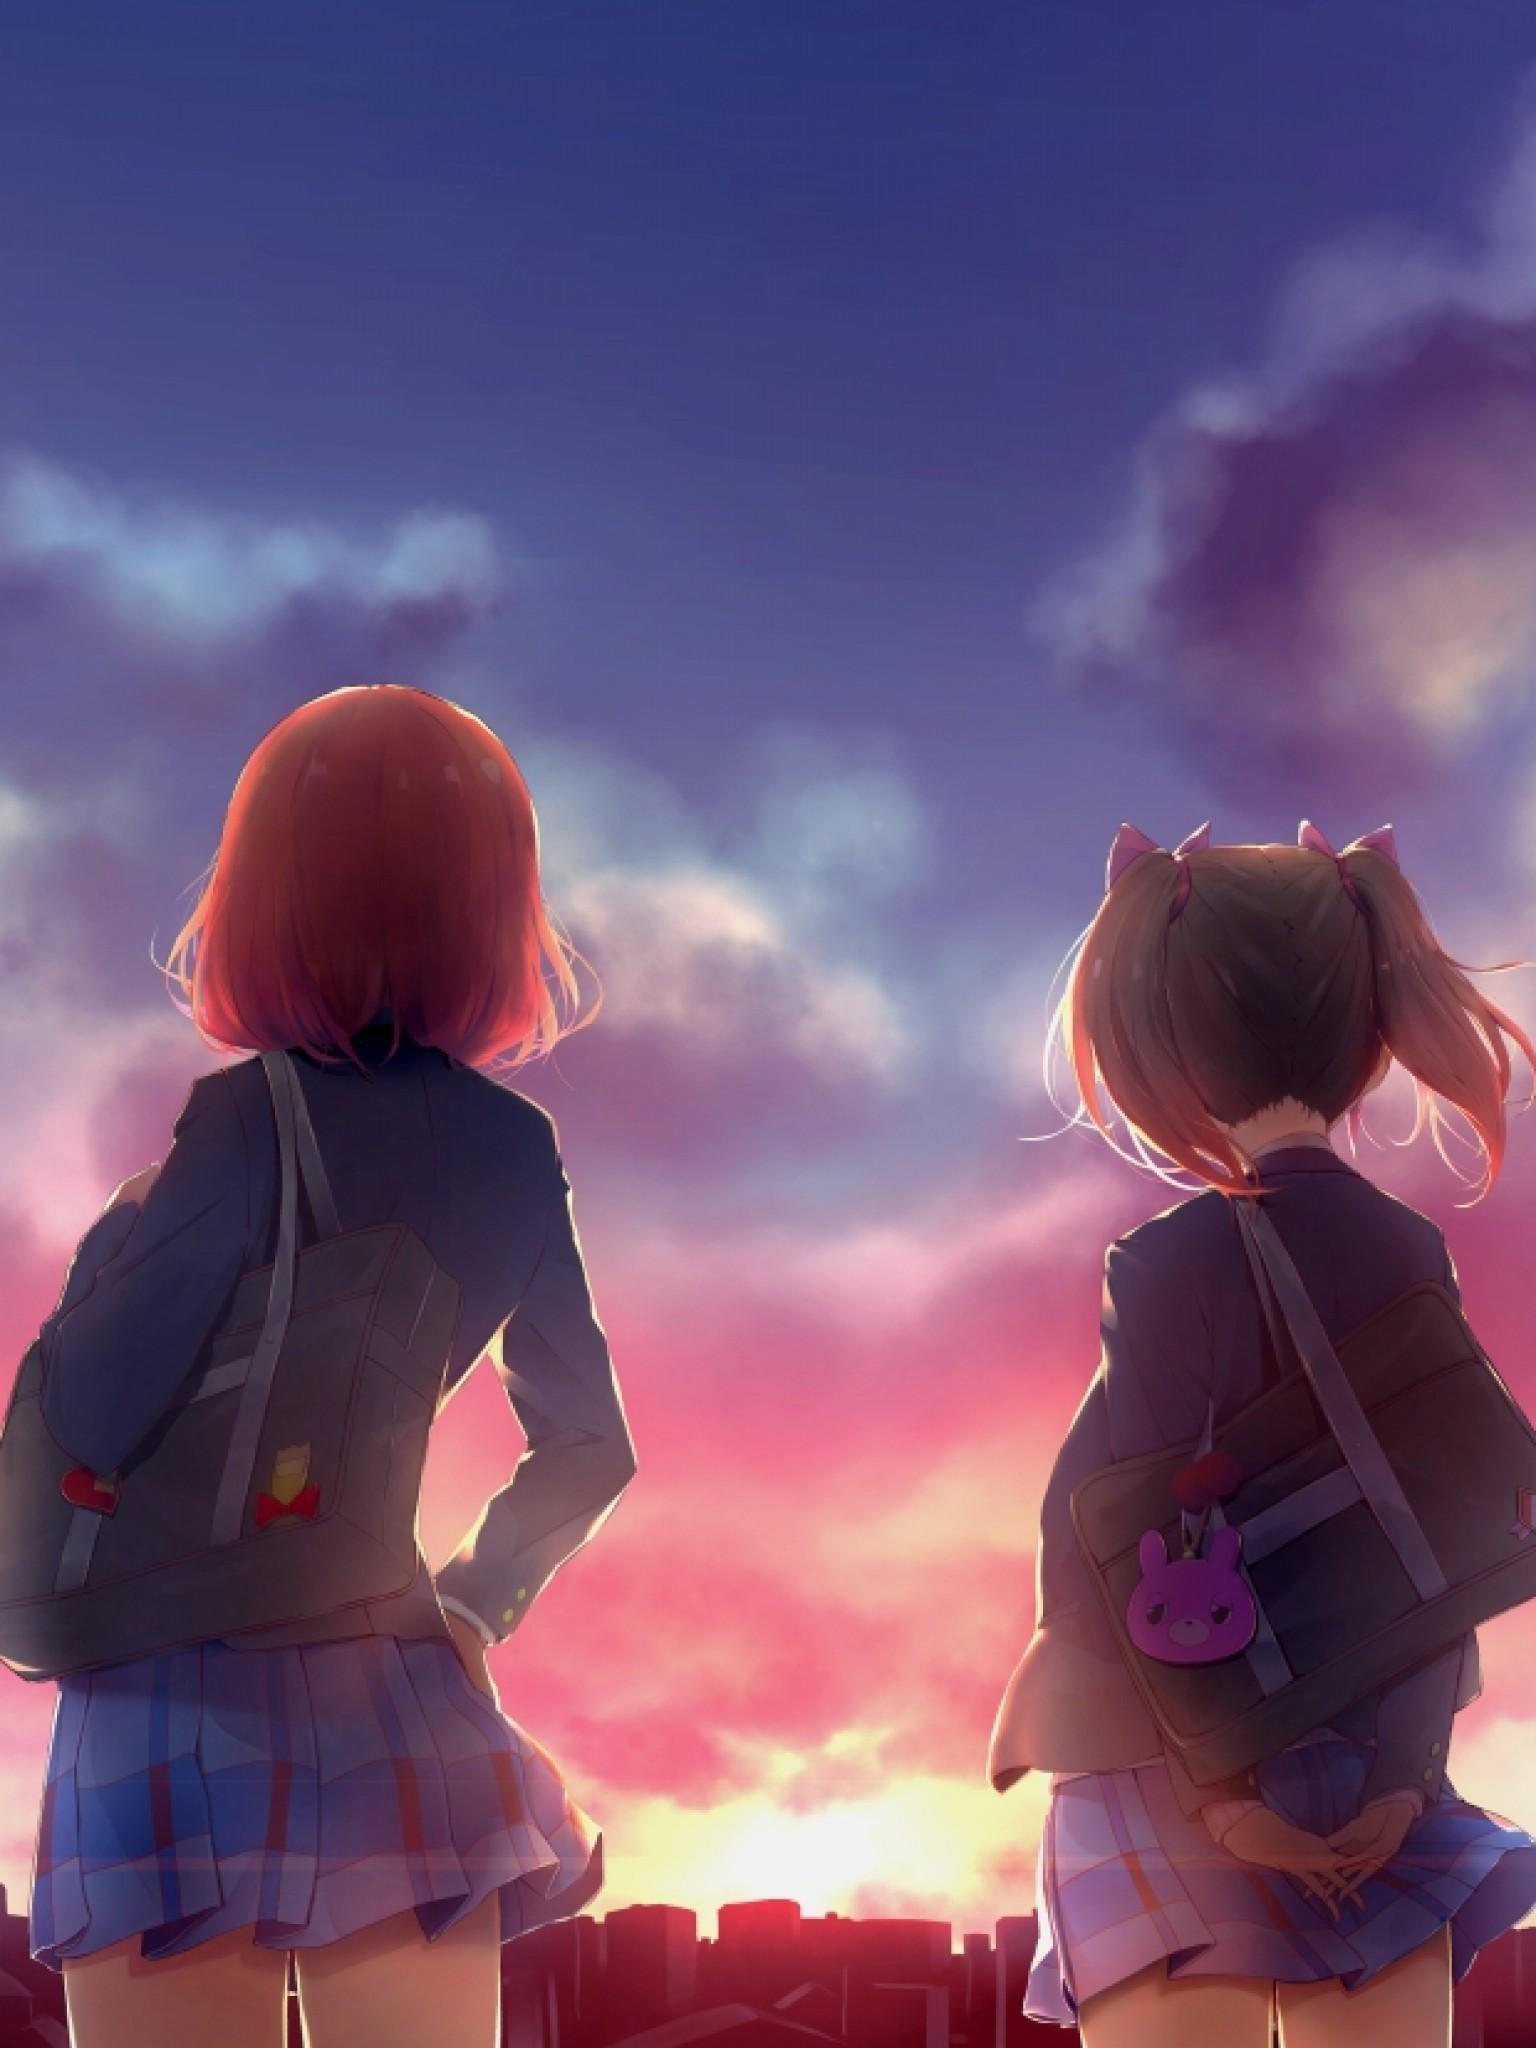 Anime Lanscape, Sunset, Clouds, Love Live - Love Wallpaper Anime 2560 X 1440 - HD Wallpaper